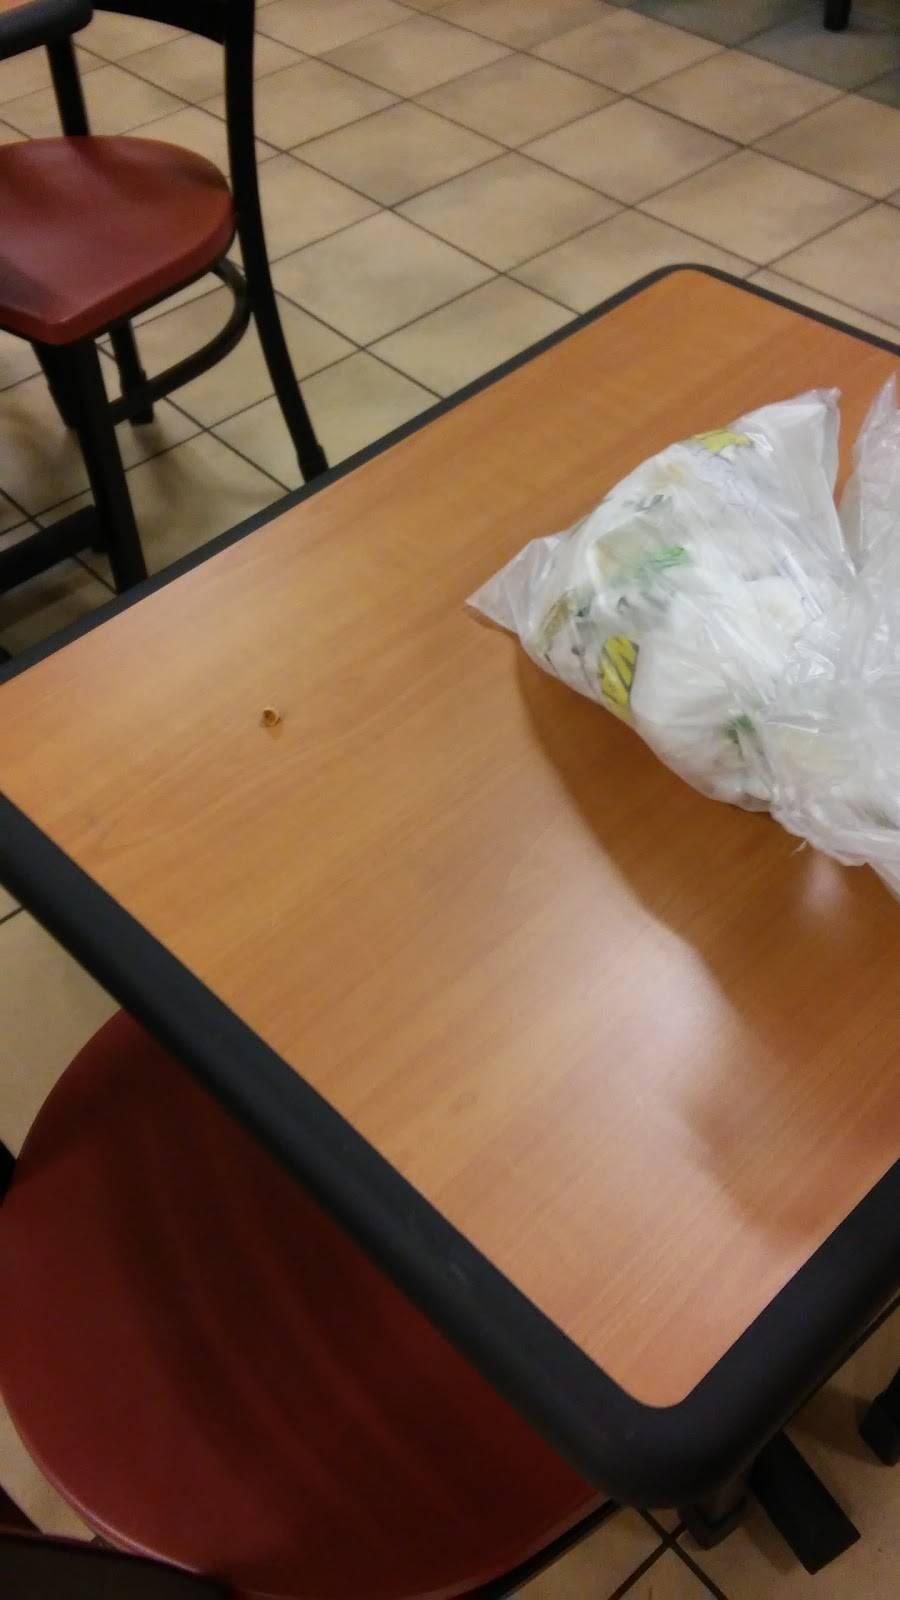 Subway - meal takeaway  | Photo 9 of 10 | Address: 8875 - A Highland Rd, Baton Rouge, LA 70808, USA | Phone: (225) 769-0034